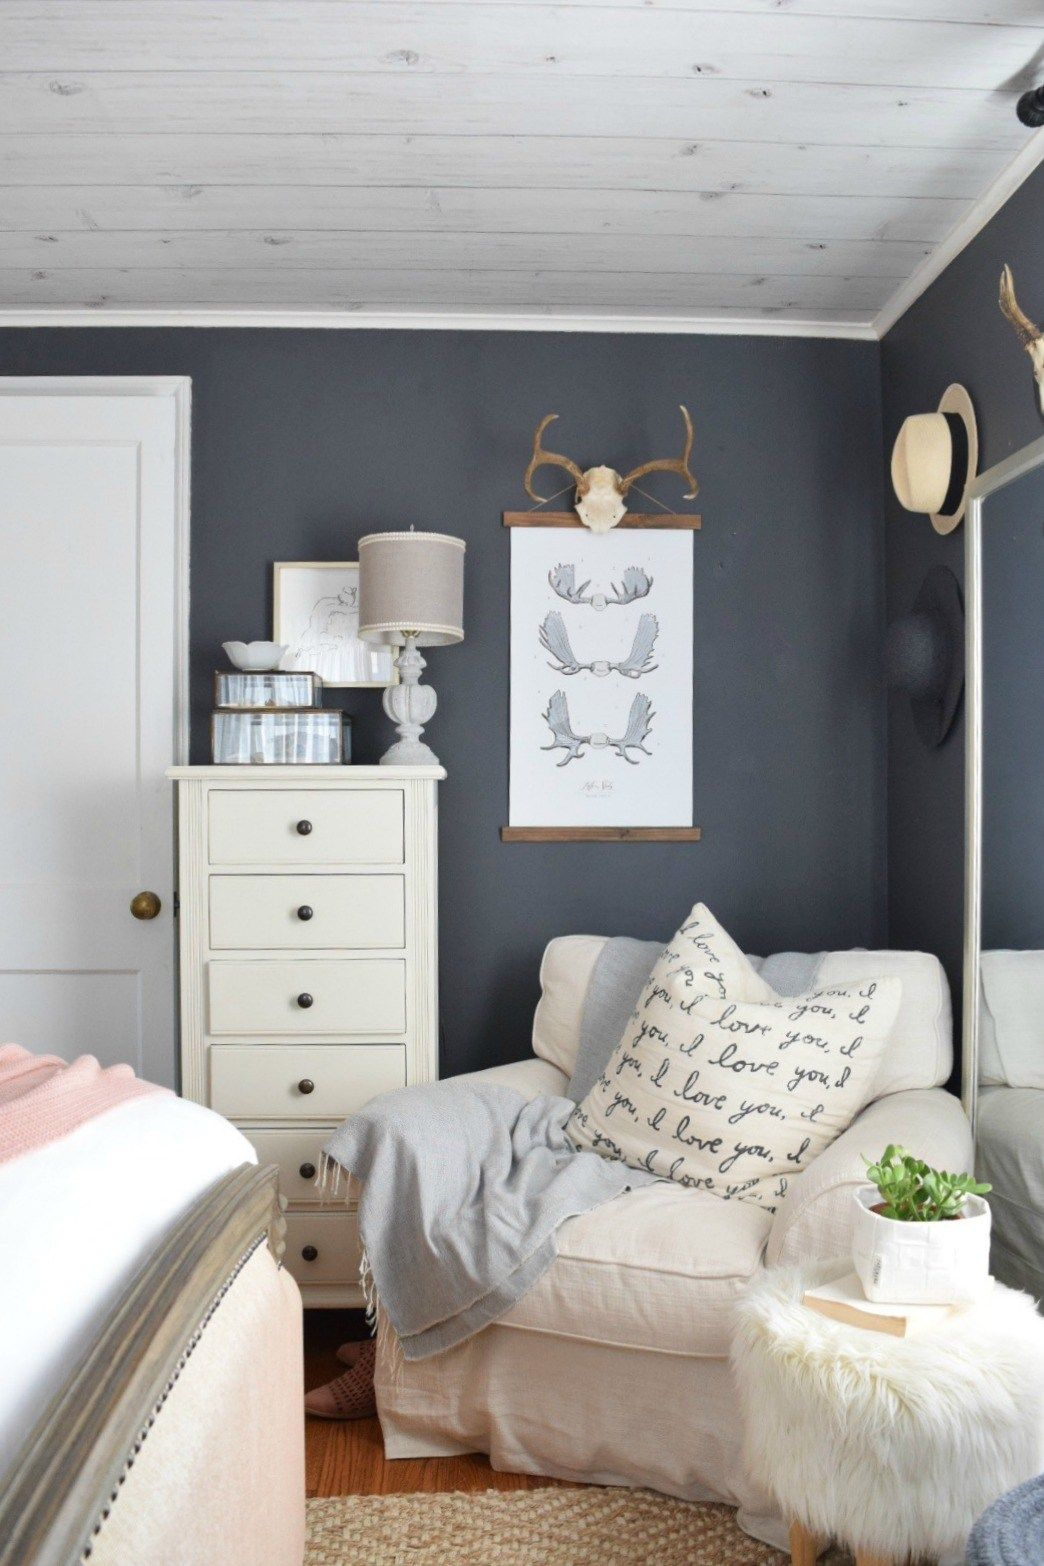 Summer Home Decor 2017 Master Bedroom and Summer Bucket